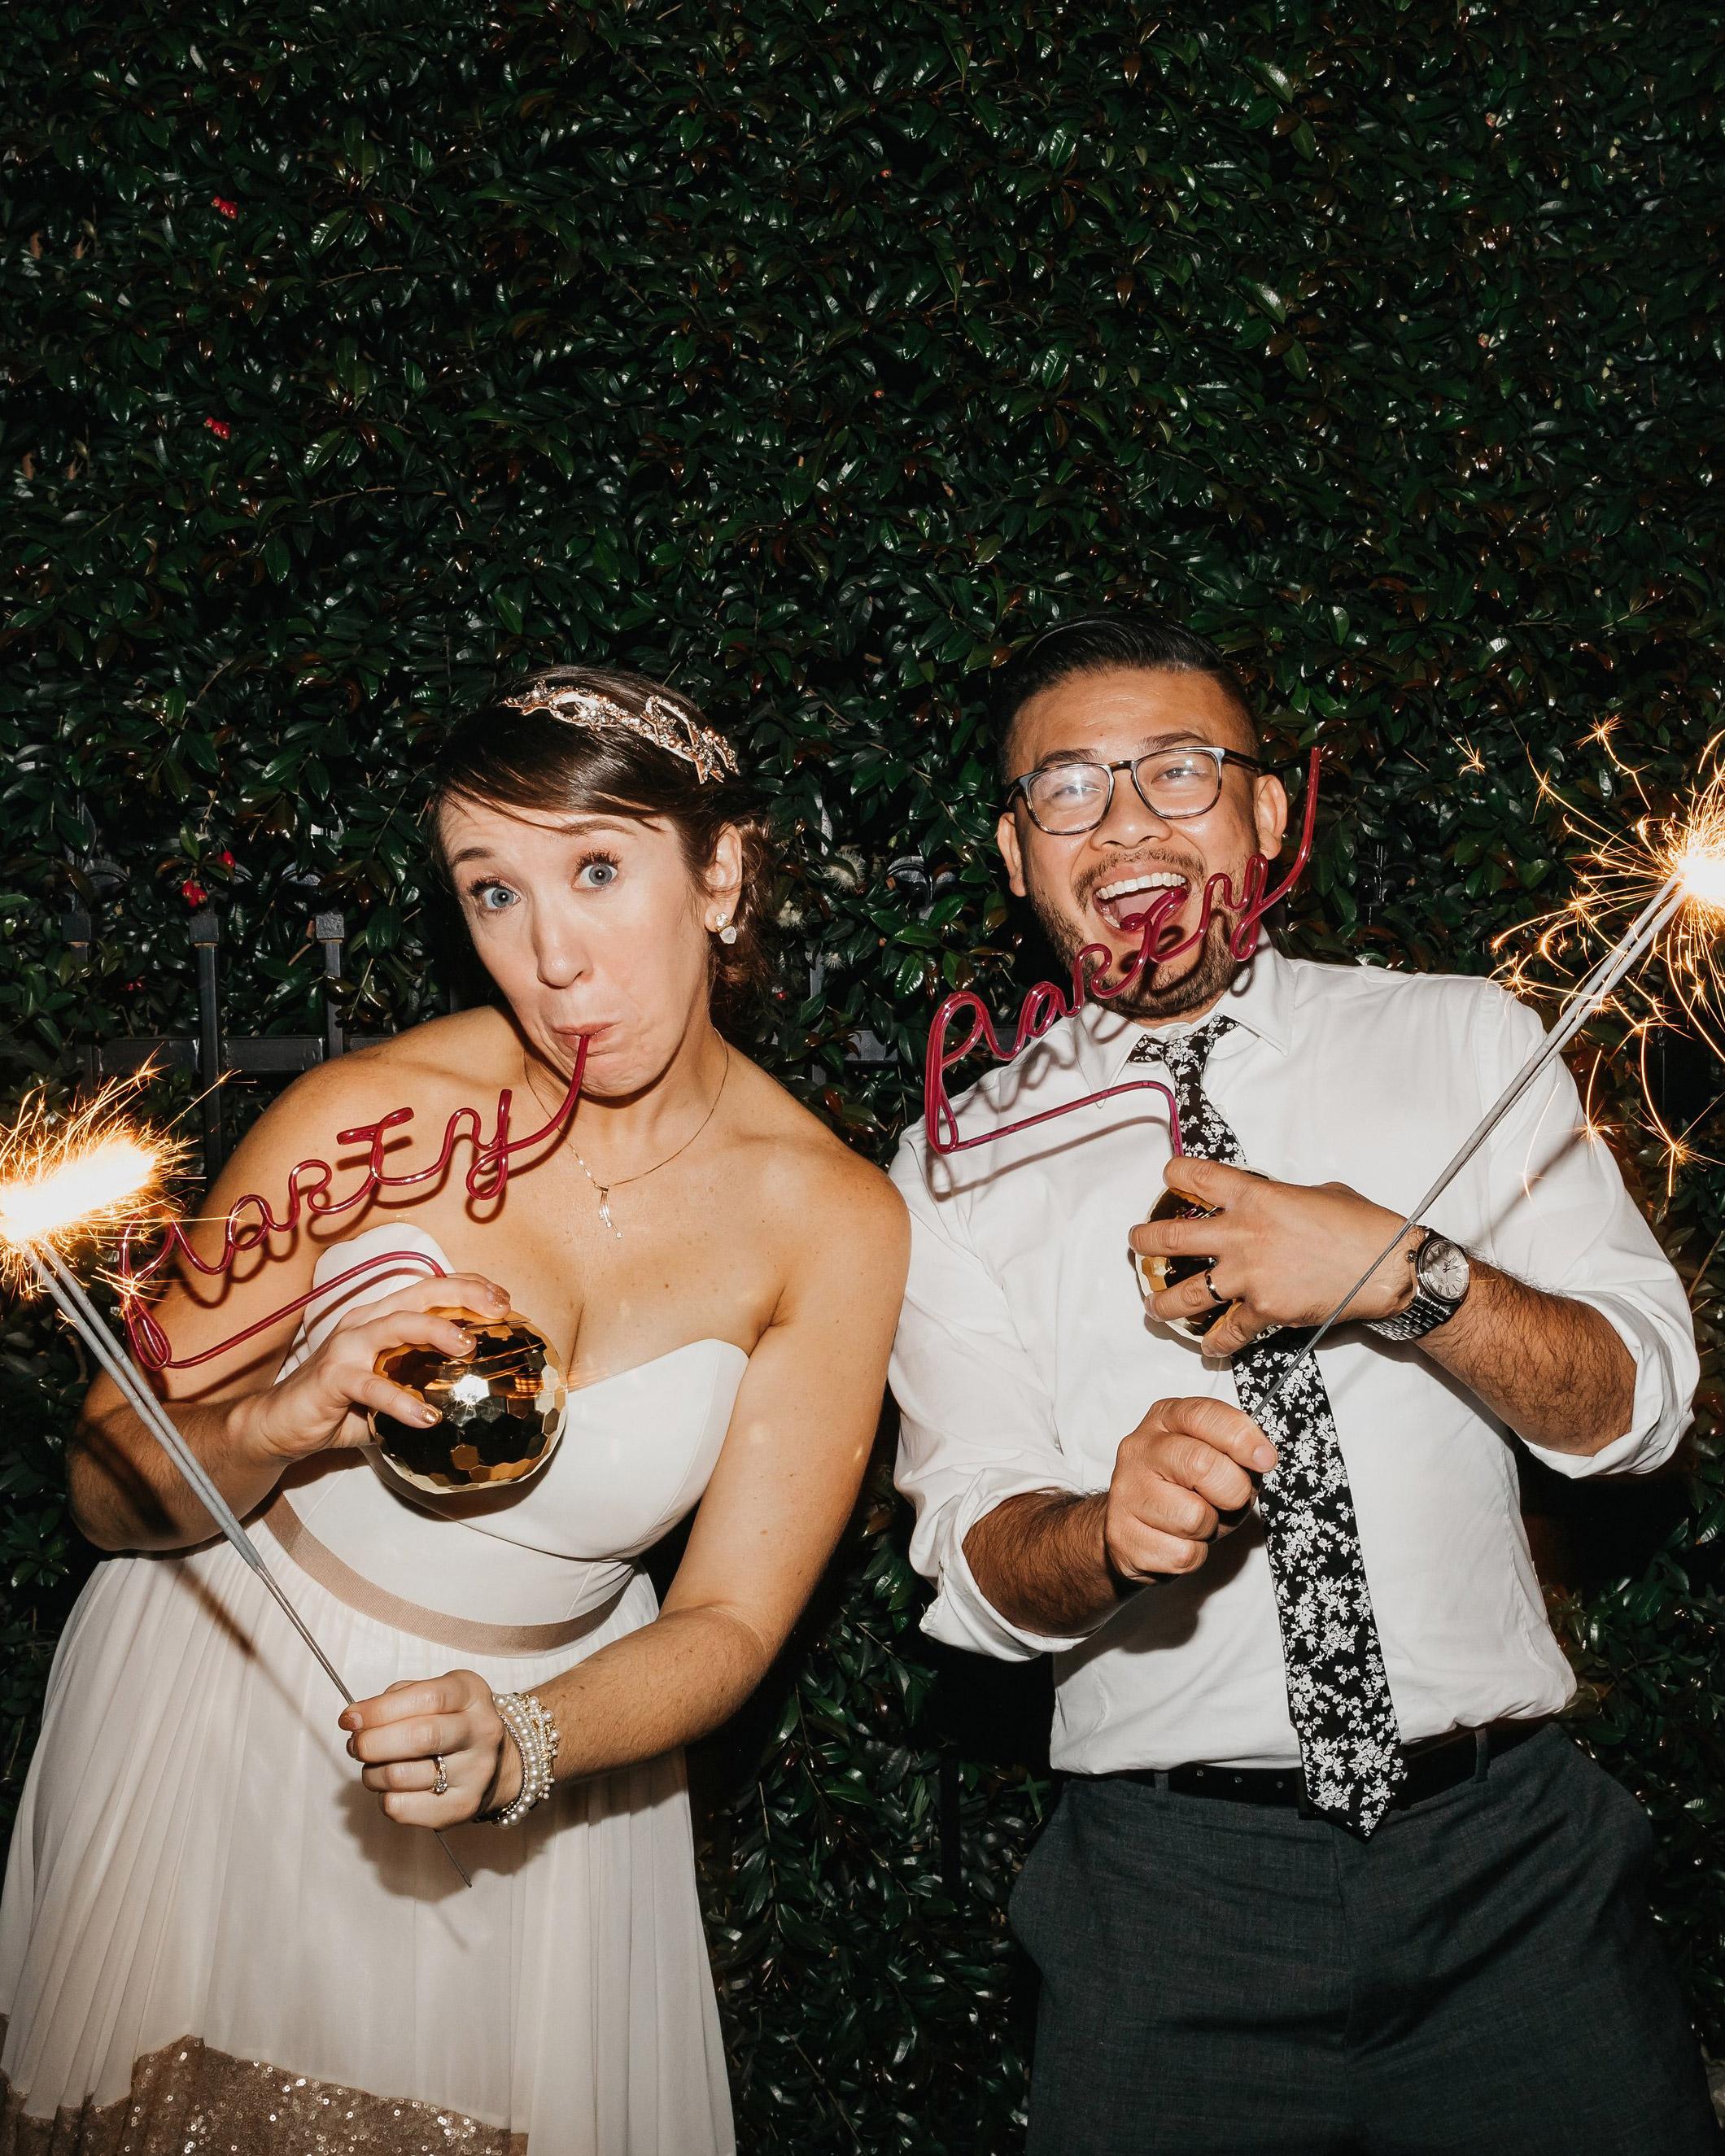 colleen pip wedding sparklers